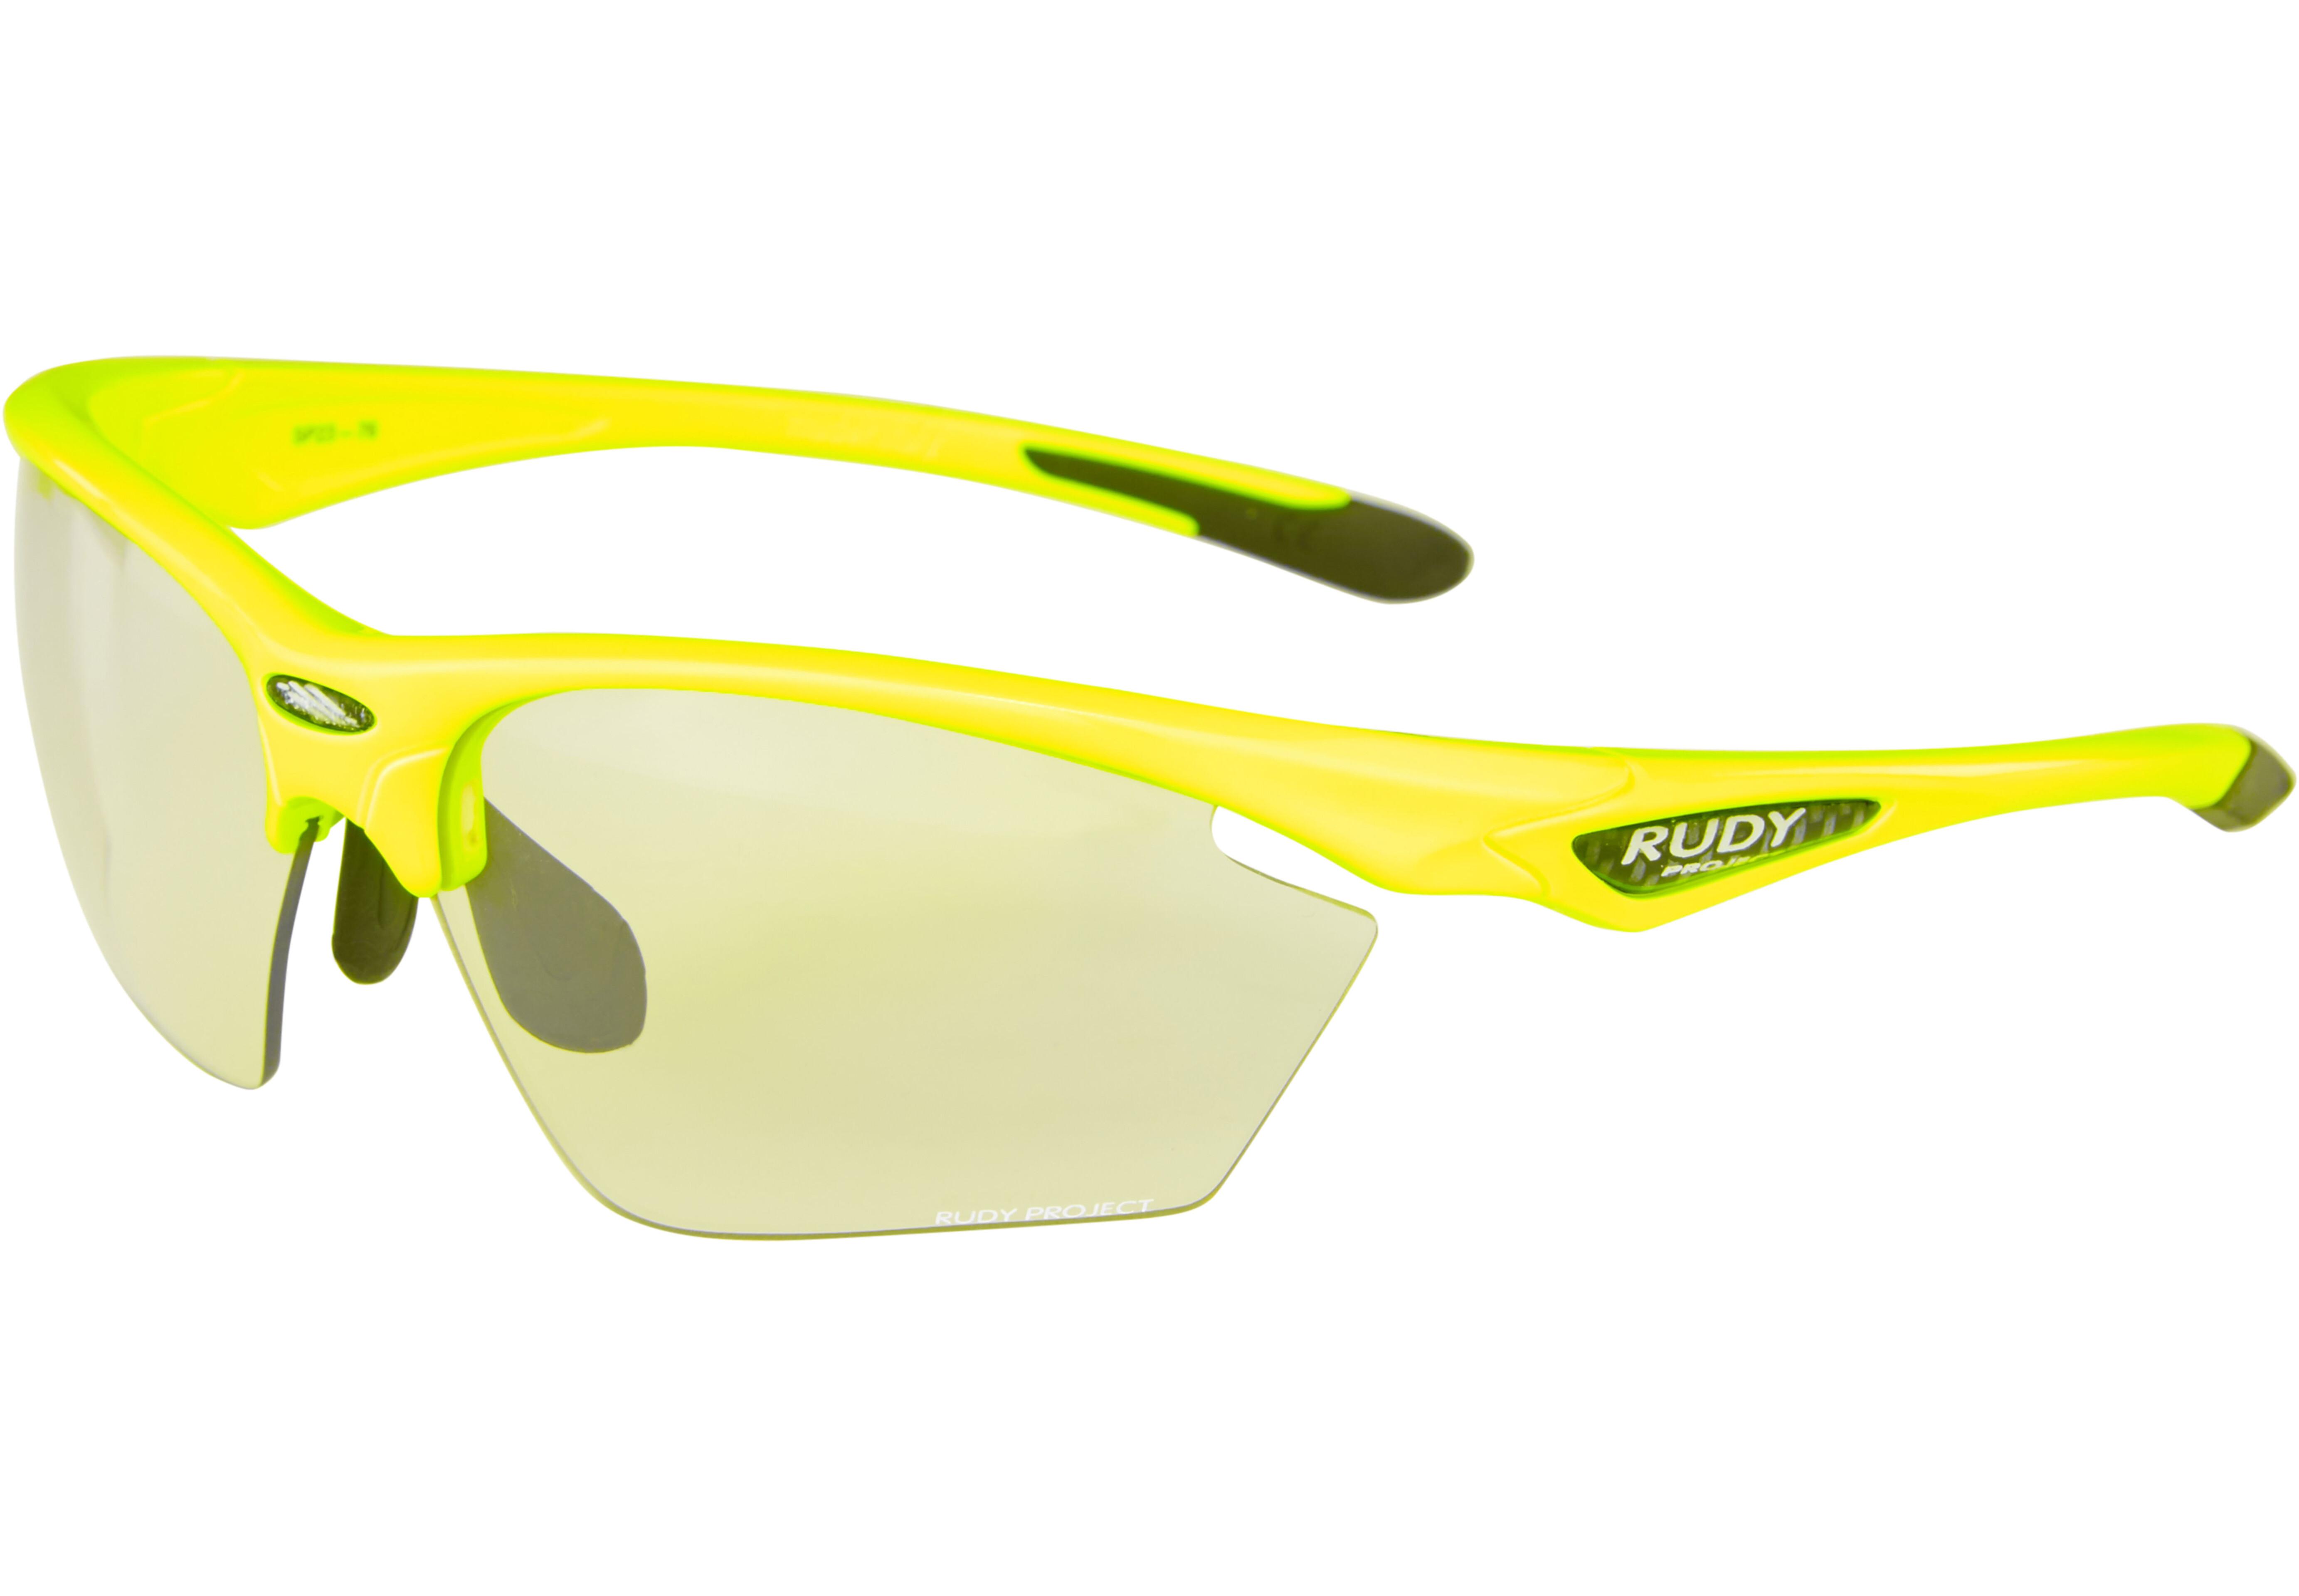 9735136716 Rudy Project Stratofly Bike Glasses yellow at Addnature.co.uk